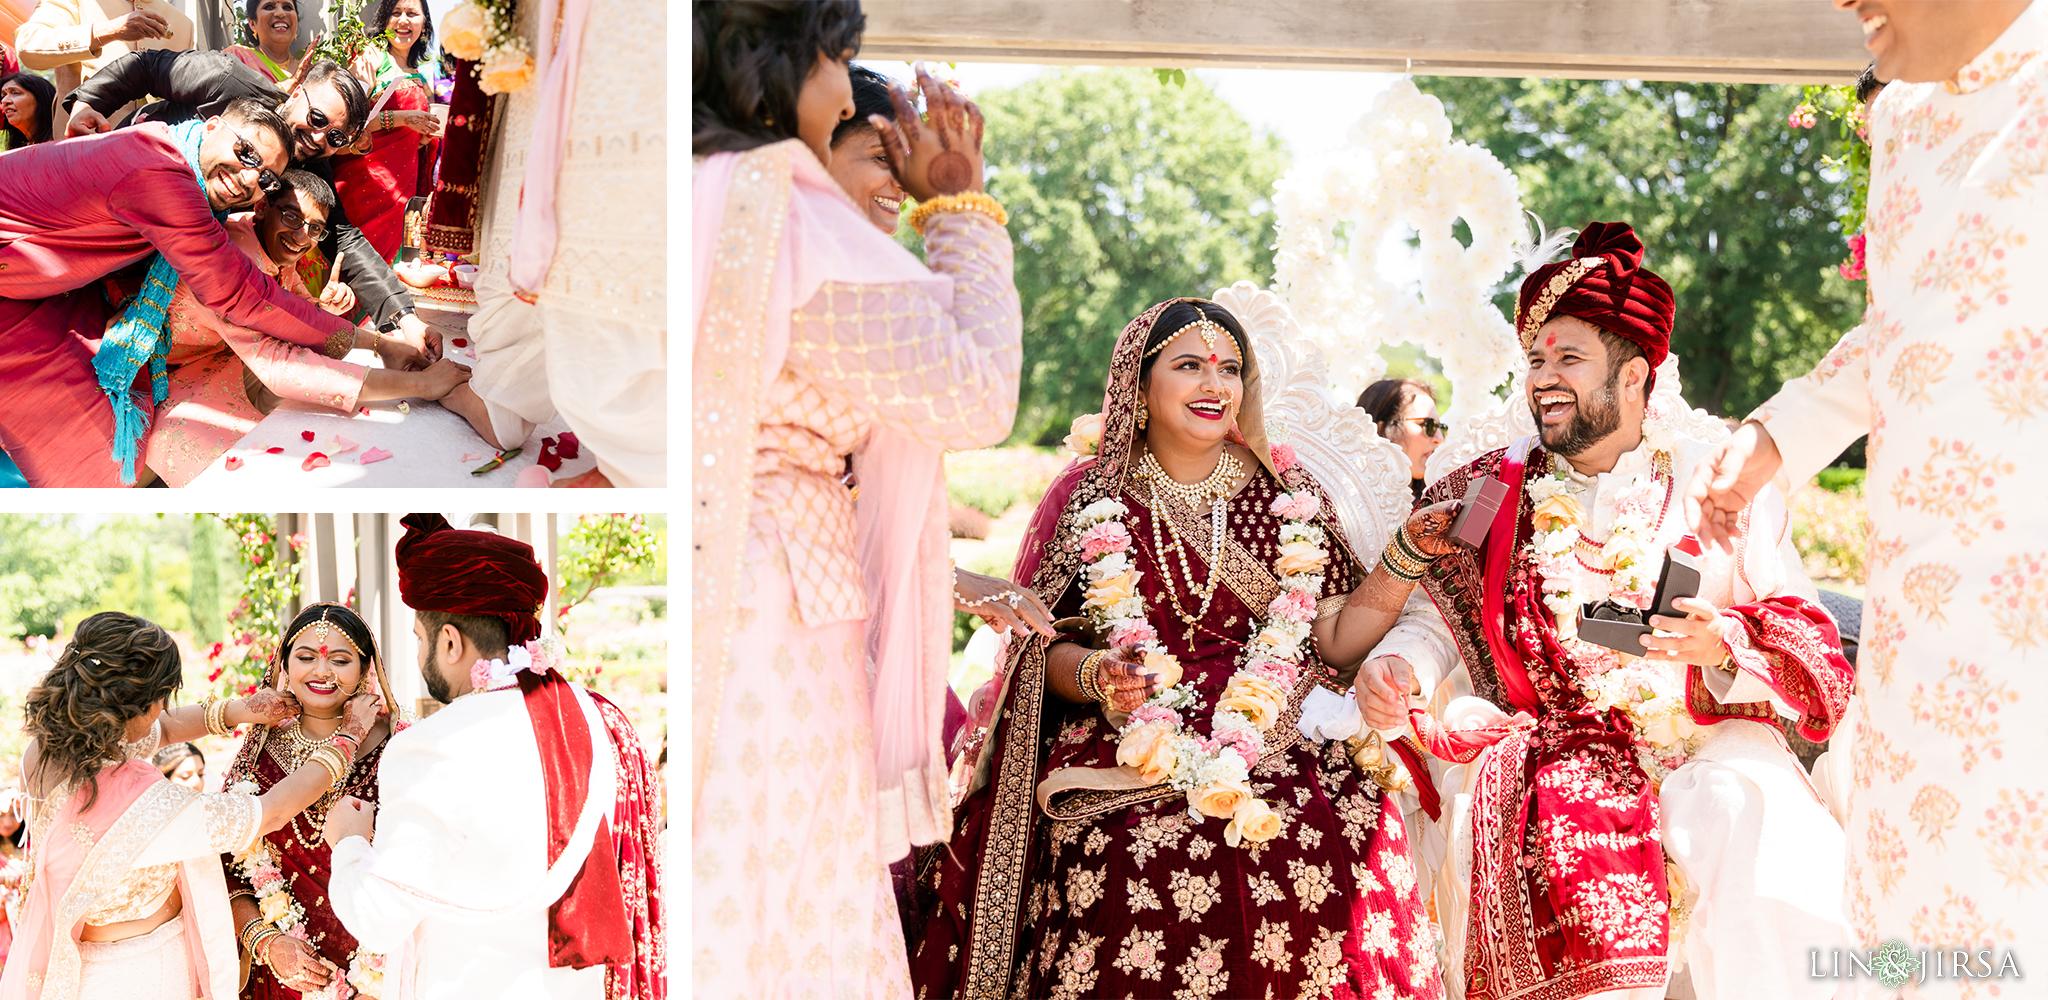 25 Delta Hotels Chesapeake Norfolk Virginia Indian Wedding Photography